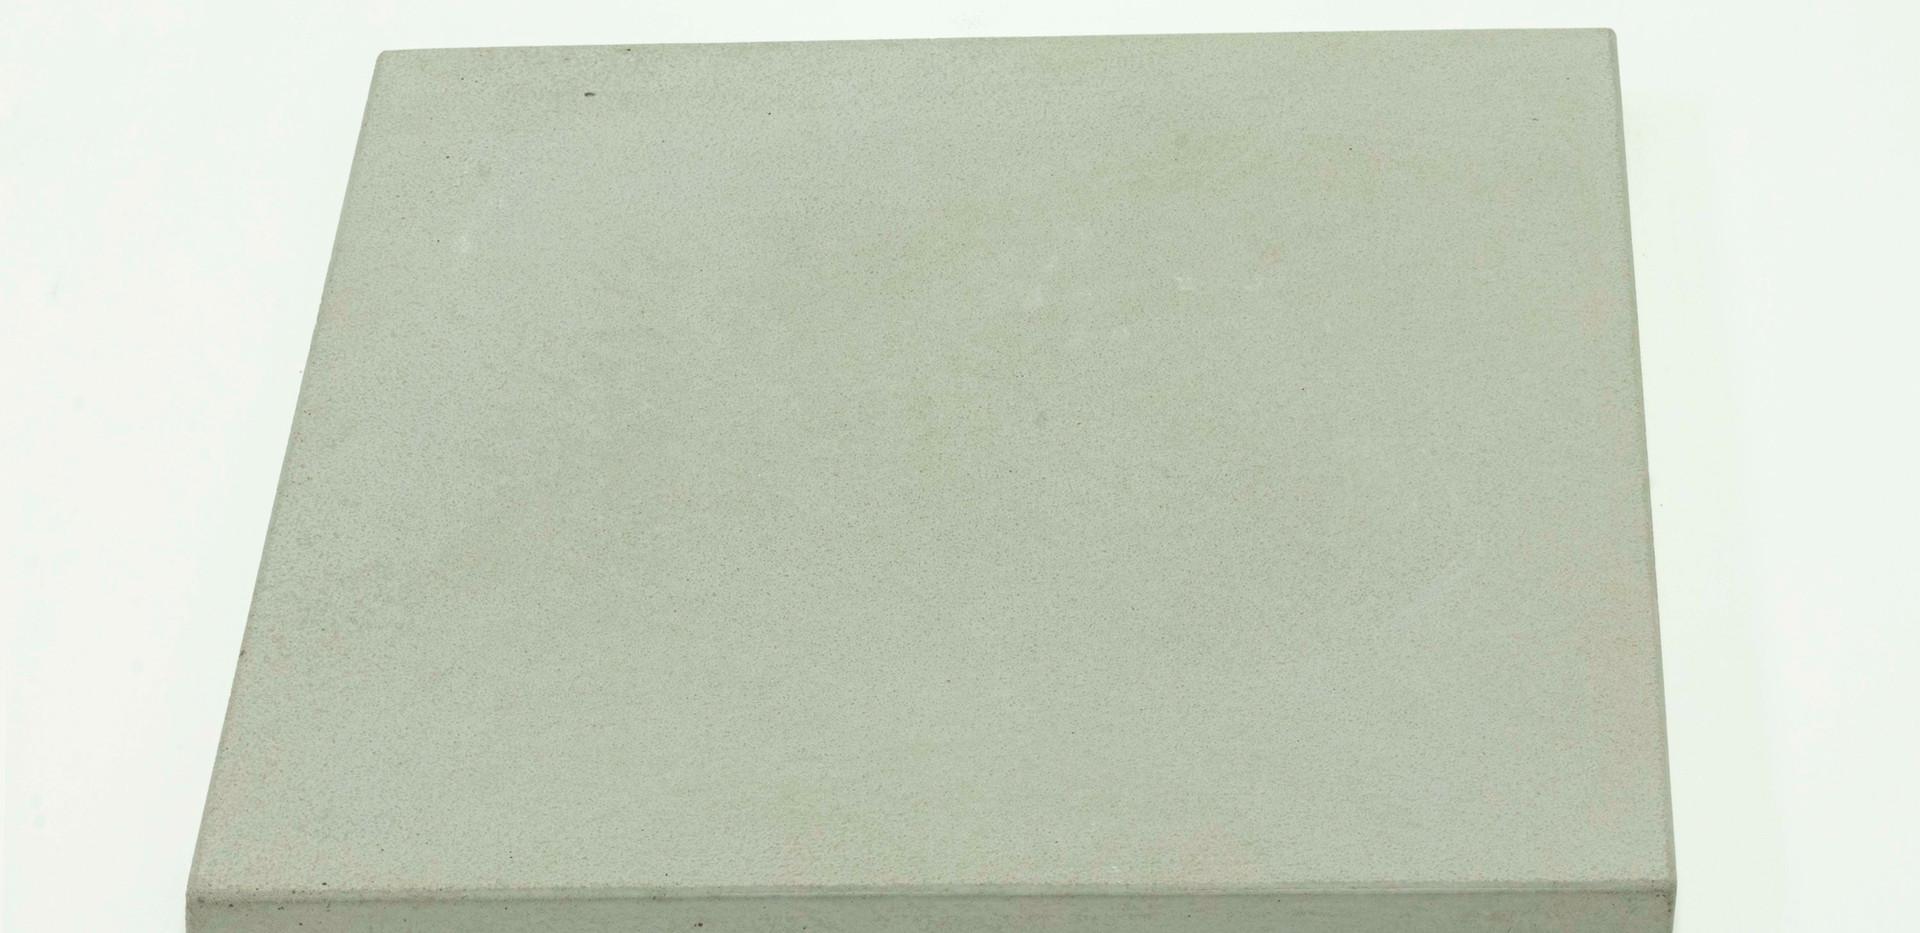 Plain Paver Concrete.jpg